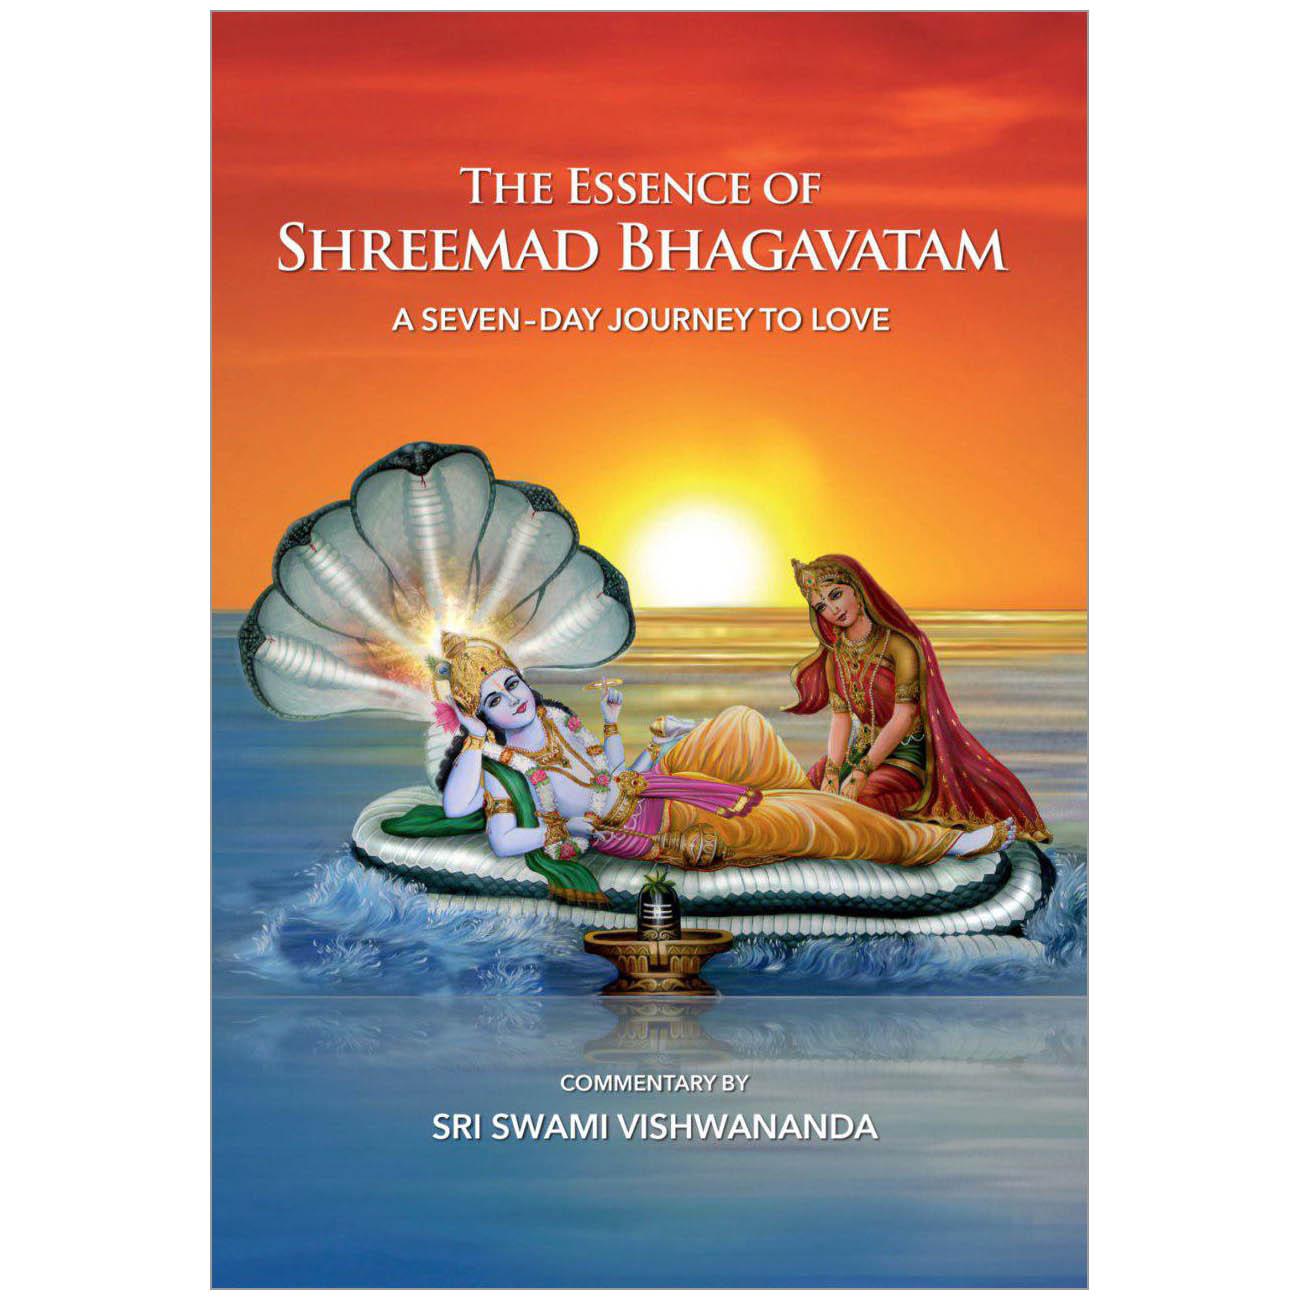 Shreemad Bhagavatam